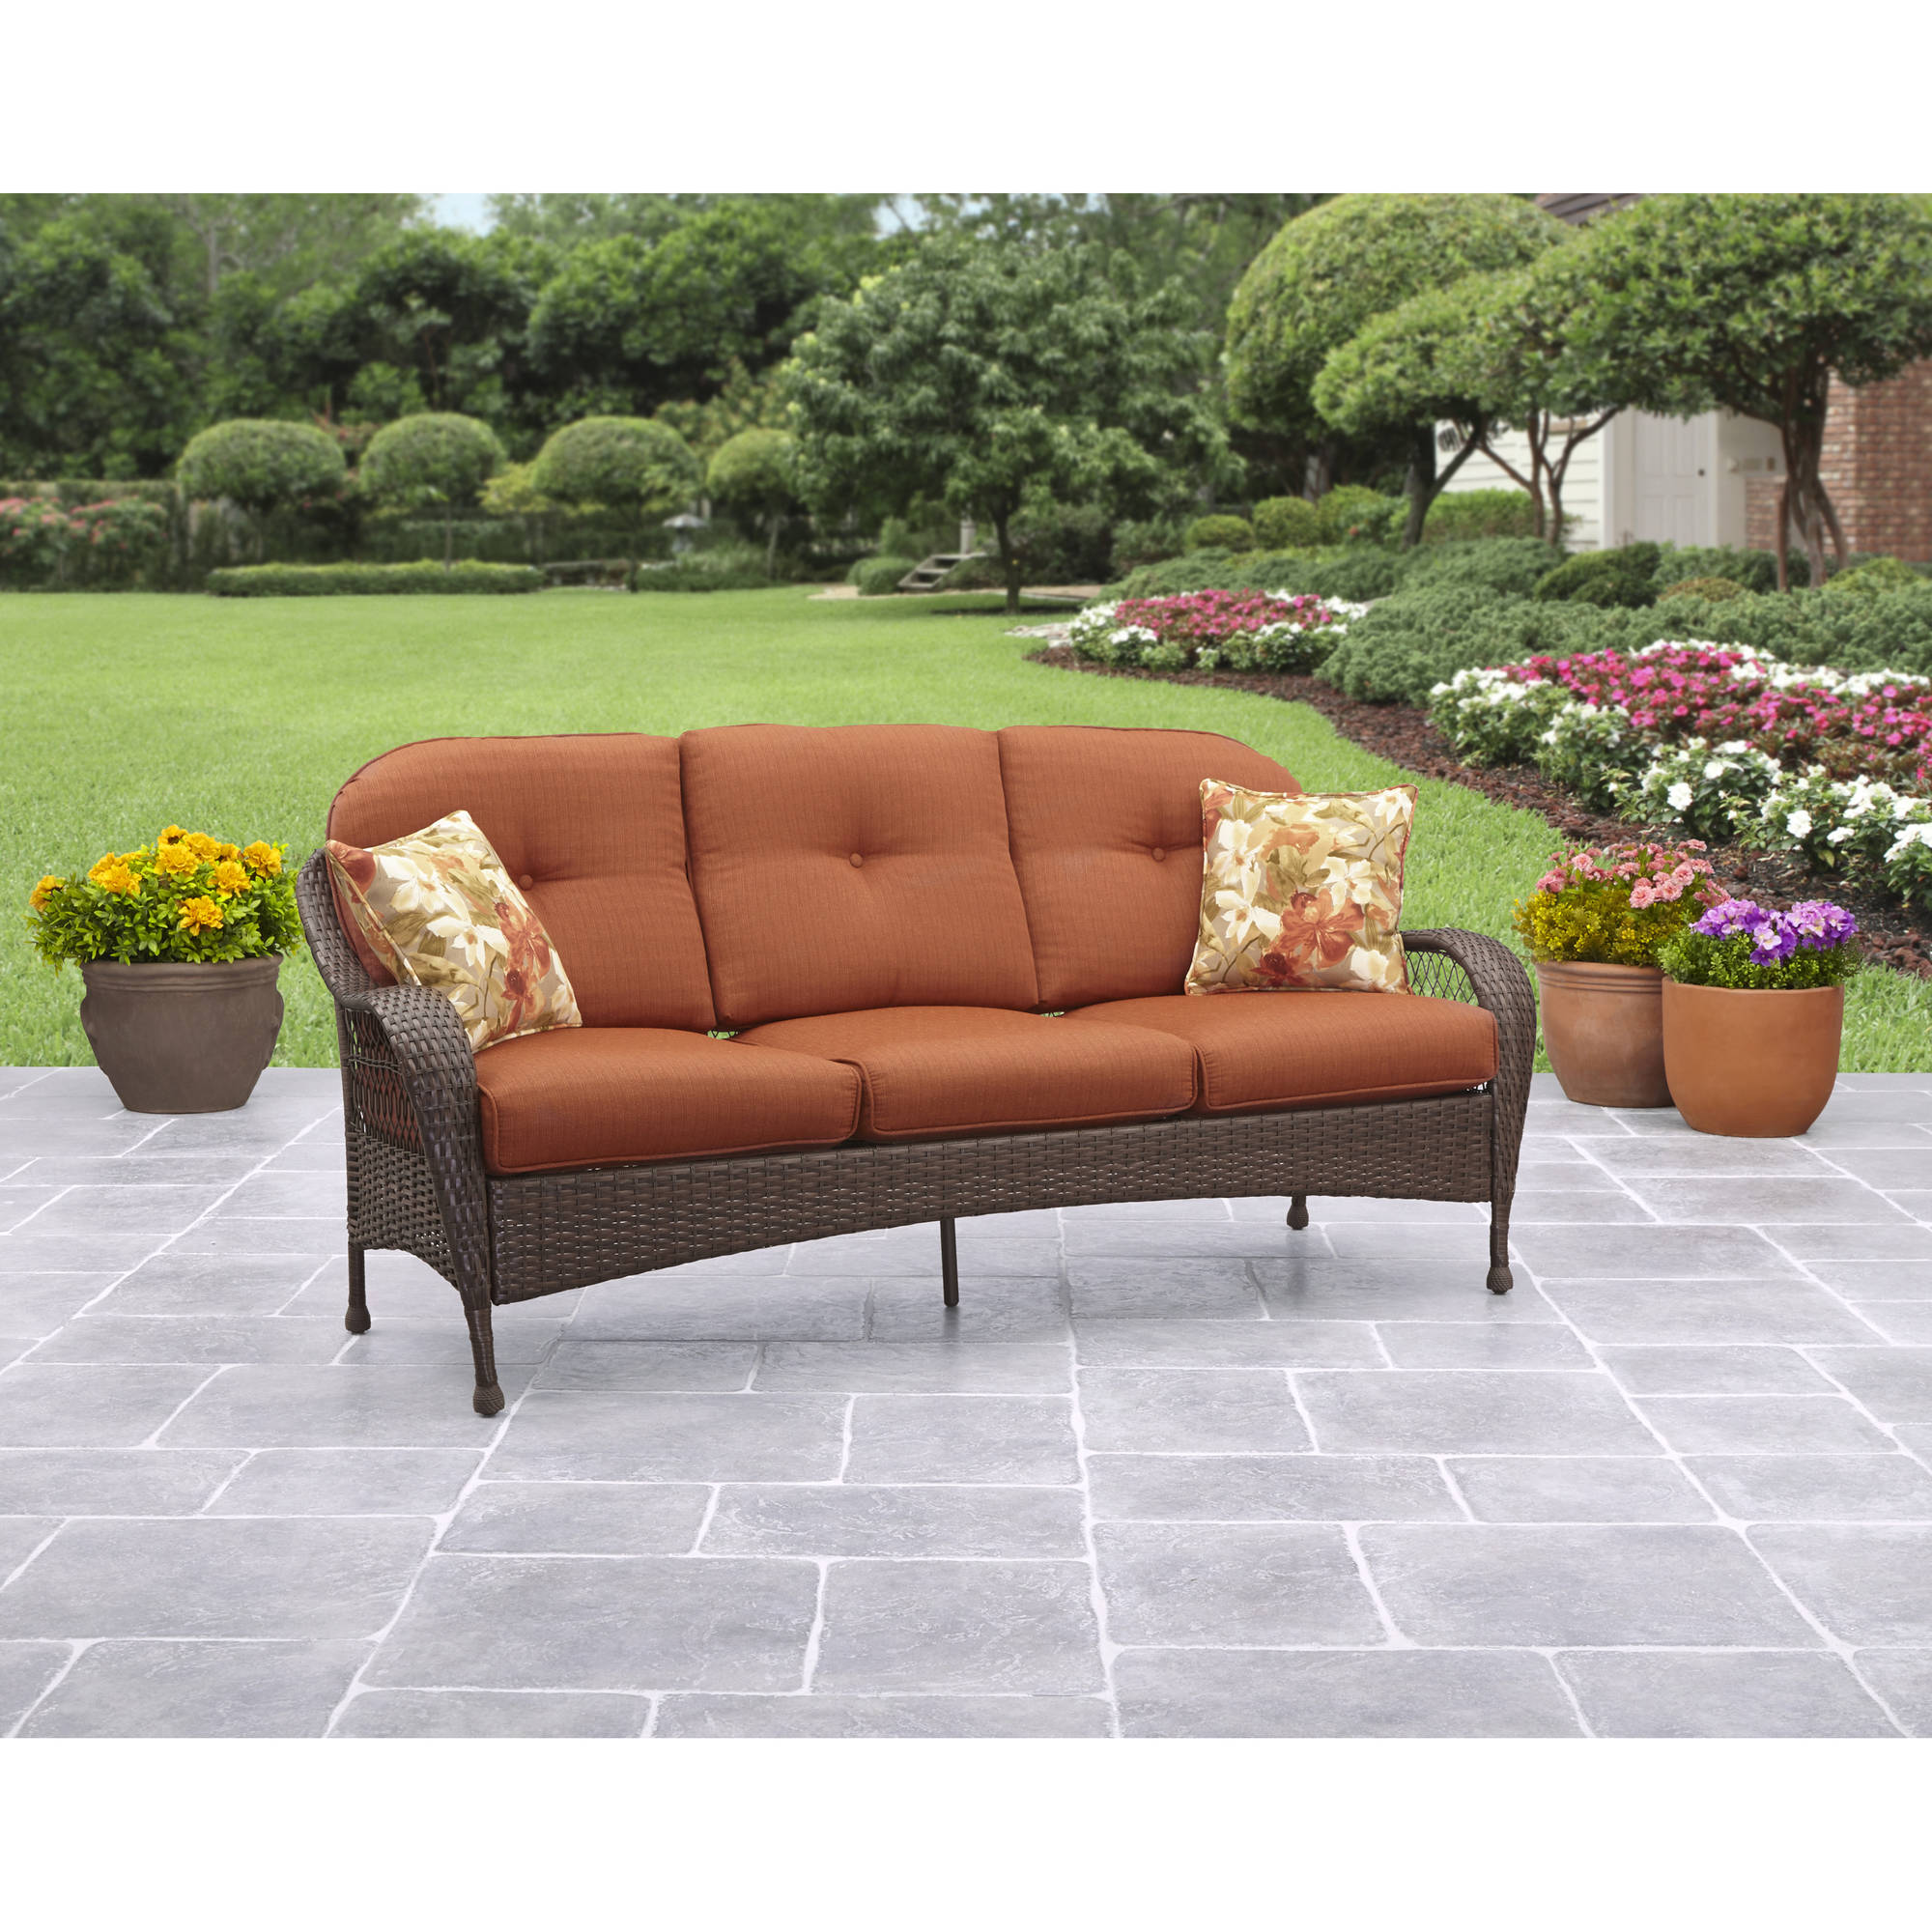 better homes and gardens azalea ridge outdoor sofa, seats 3 - walmart.com ASFYPEL